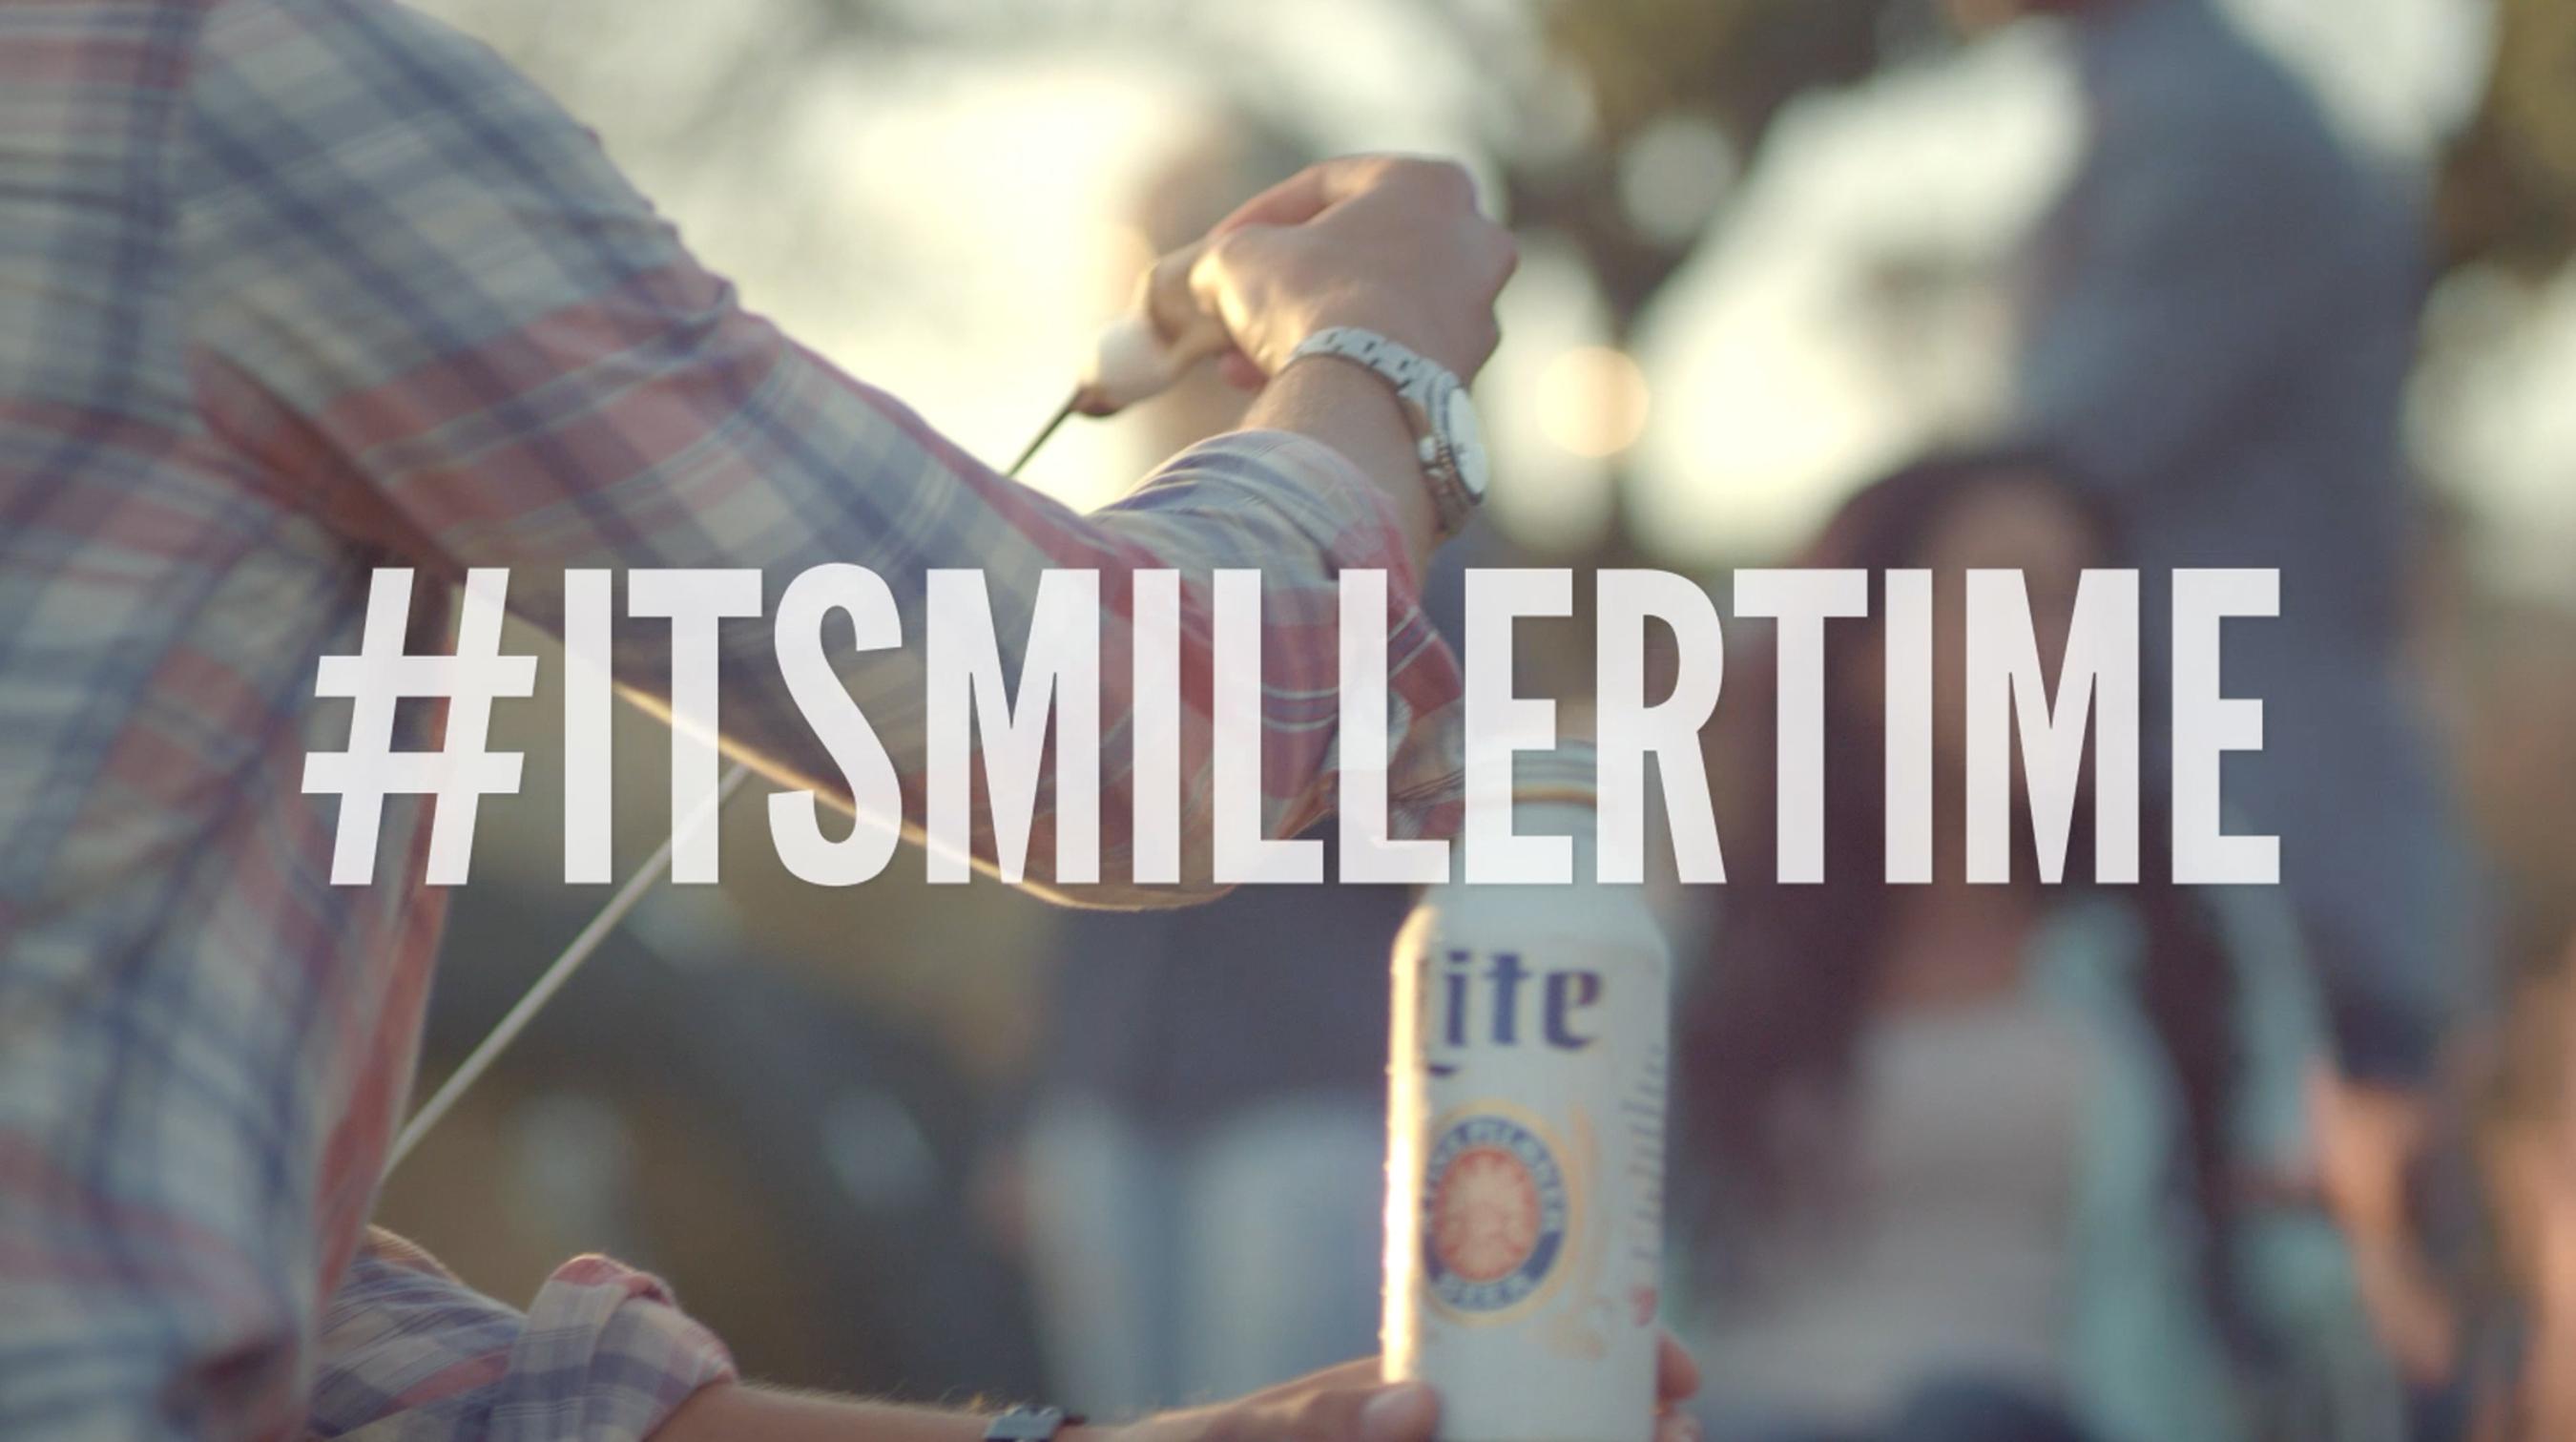 #ItsMillerTime. (PRNewsFoto/Miller Brewing Company)